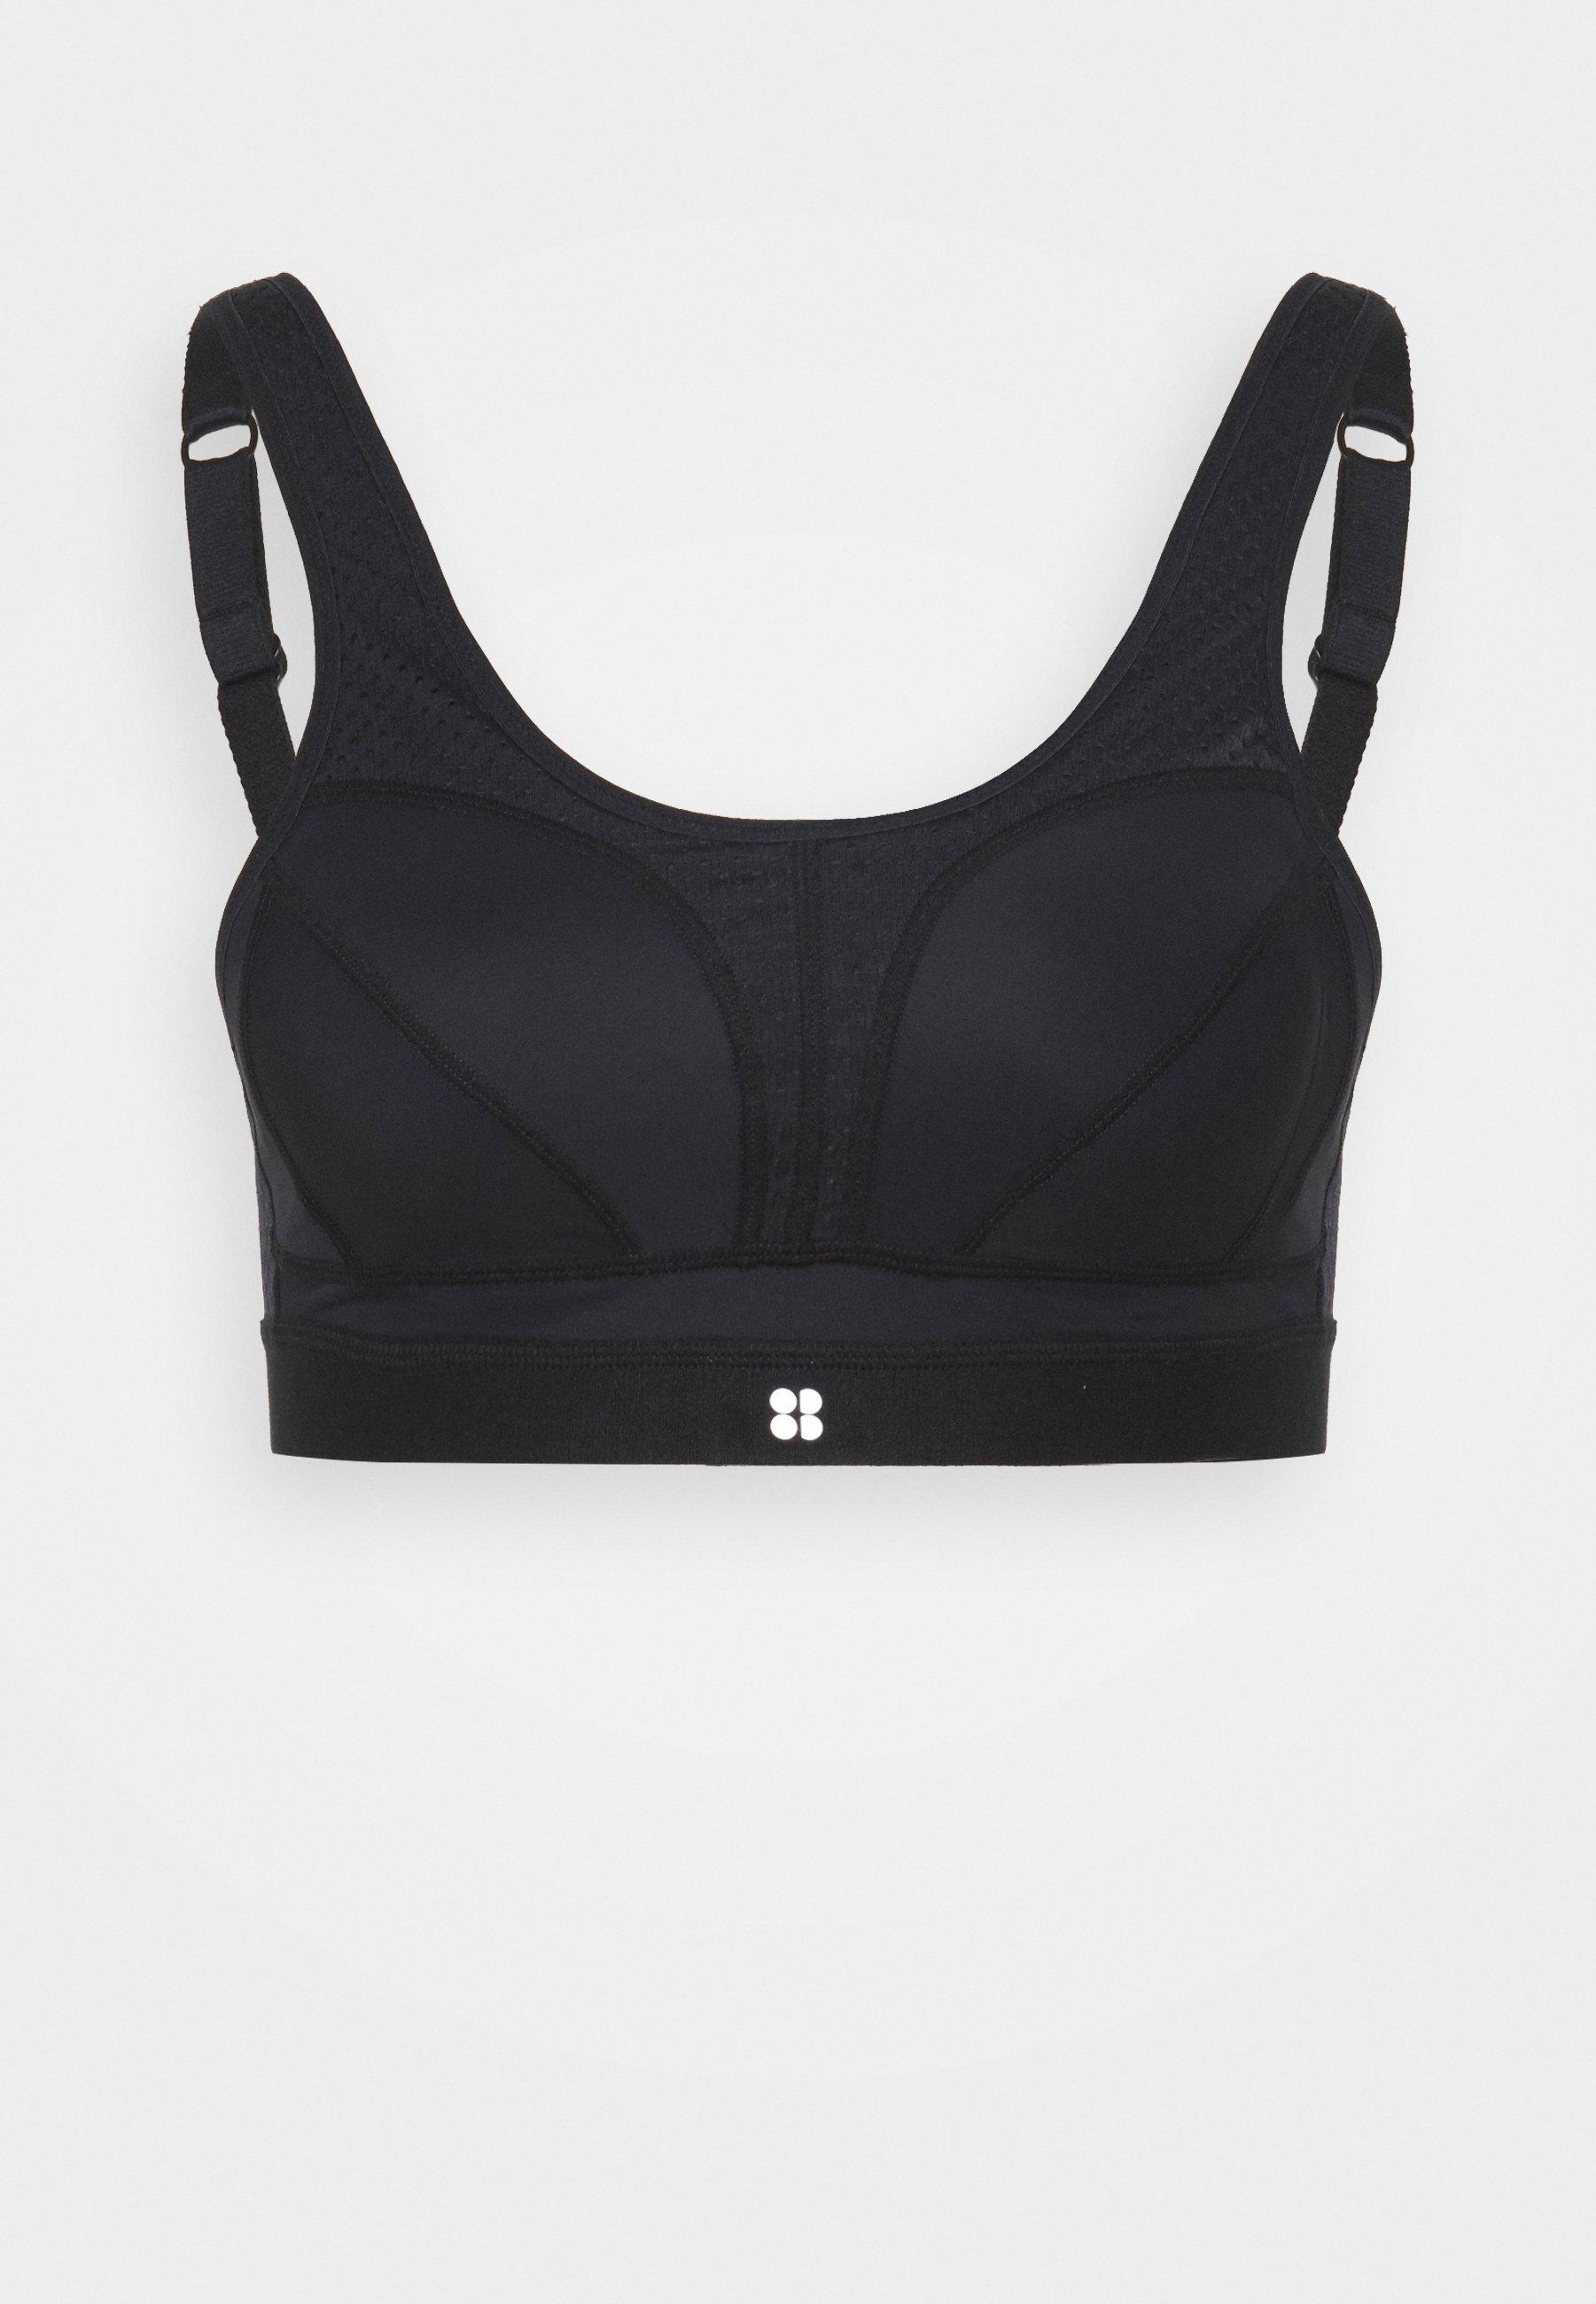 Women VICTORY RUNNING BRA - Medium support sports bra